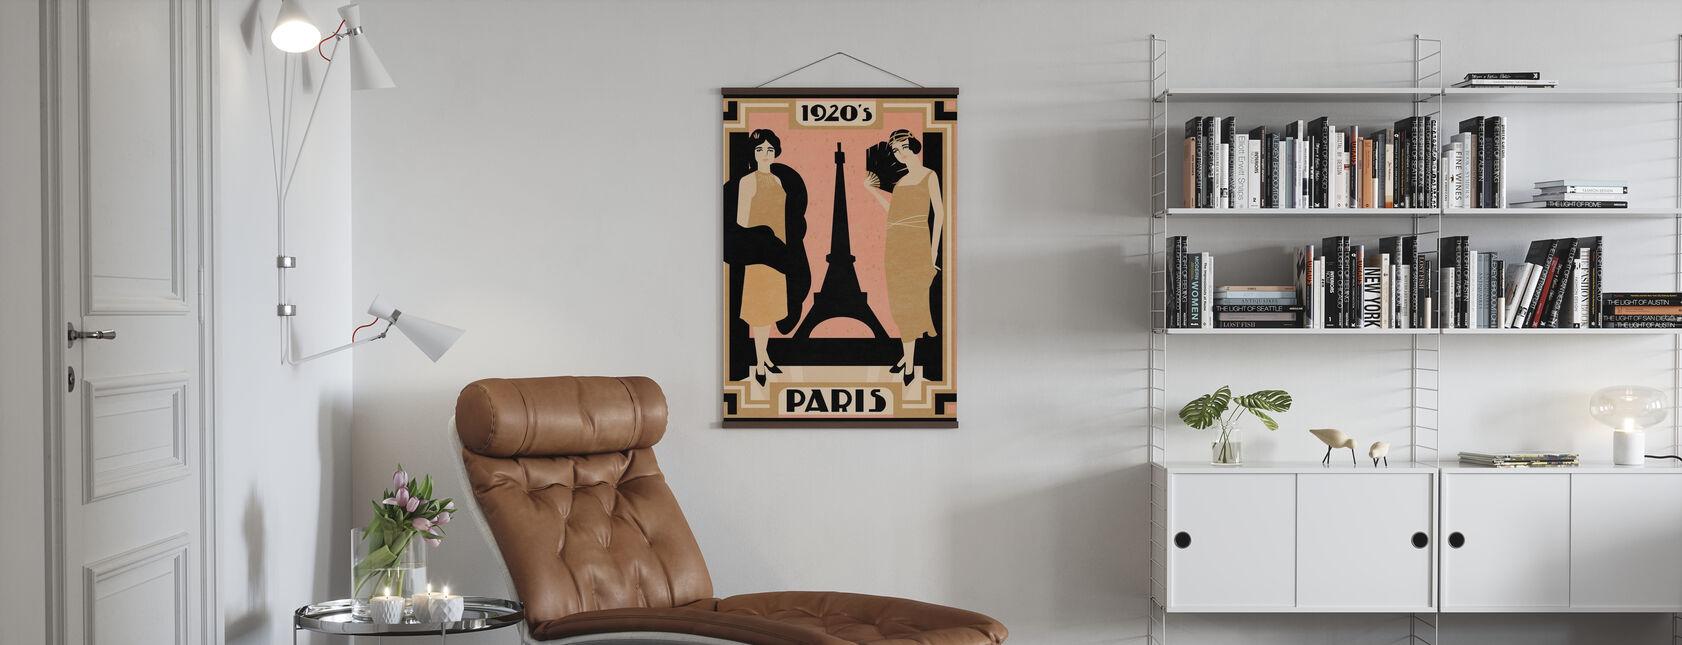 1920 Paris - Poster - Living Room